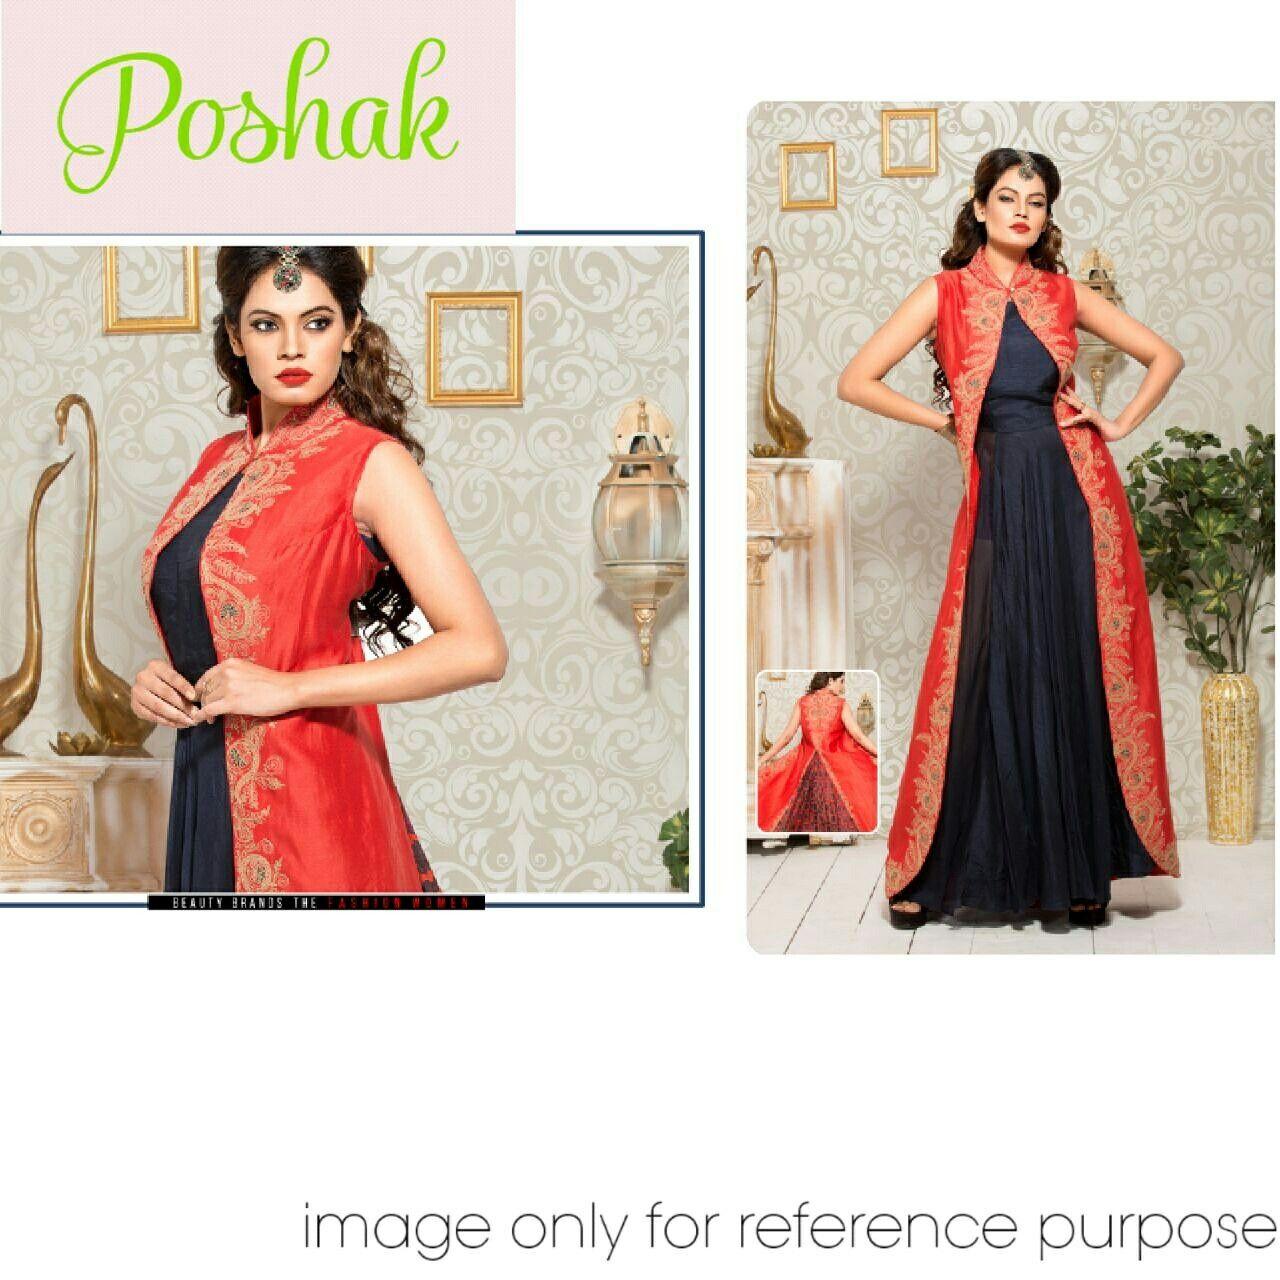 Find this Pin and more on Poshak by poshakkurti.